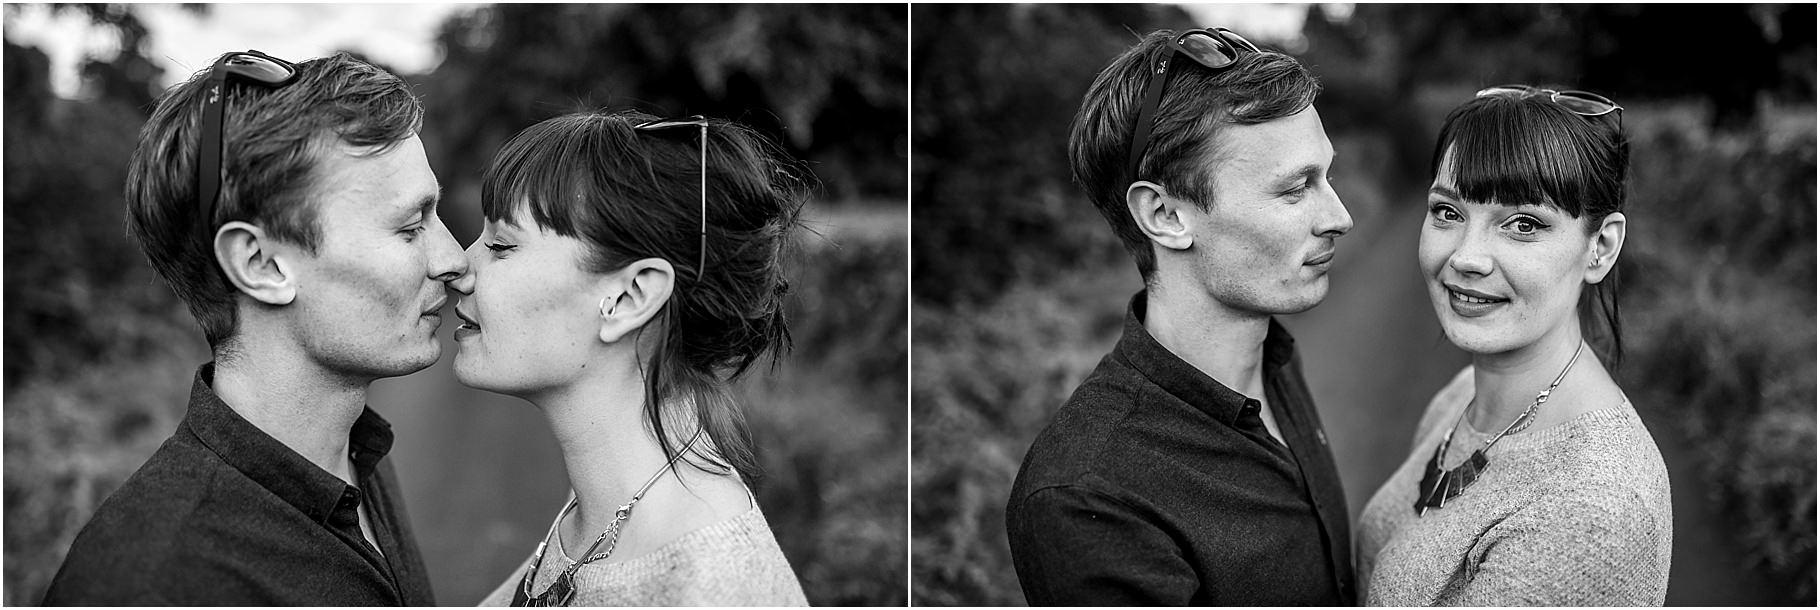 downham-village-portraits-29.jpg